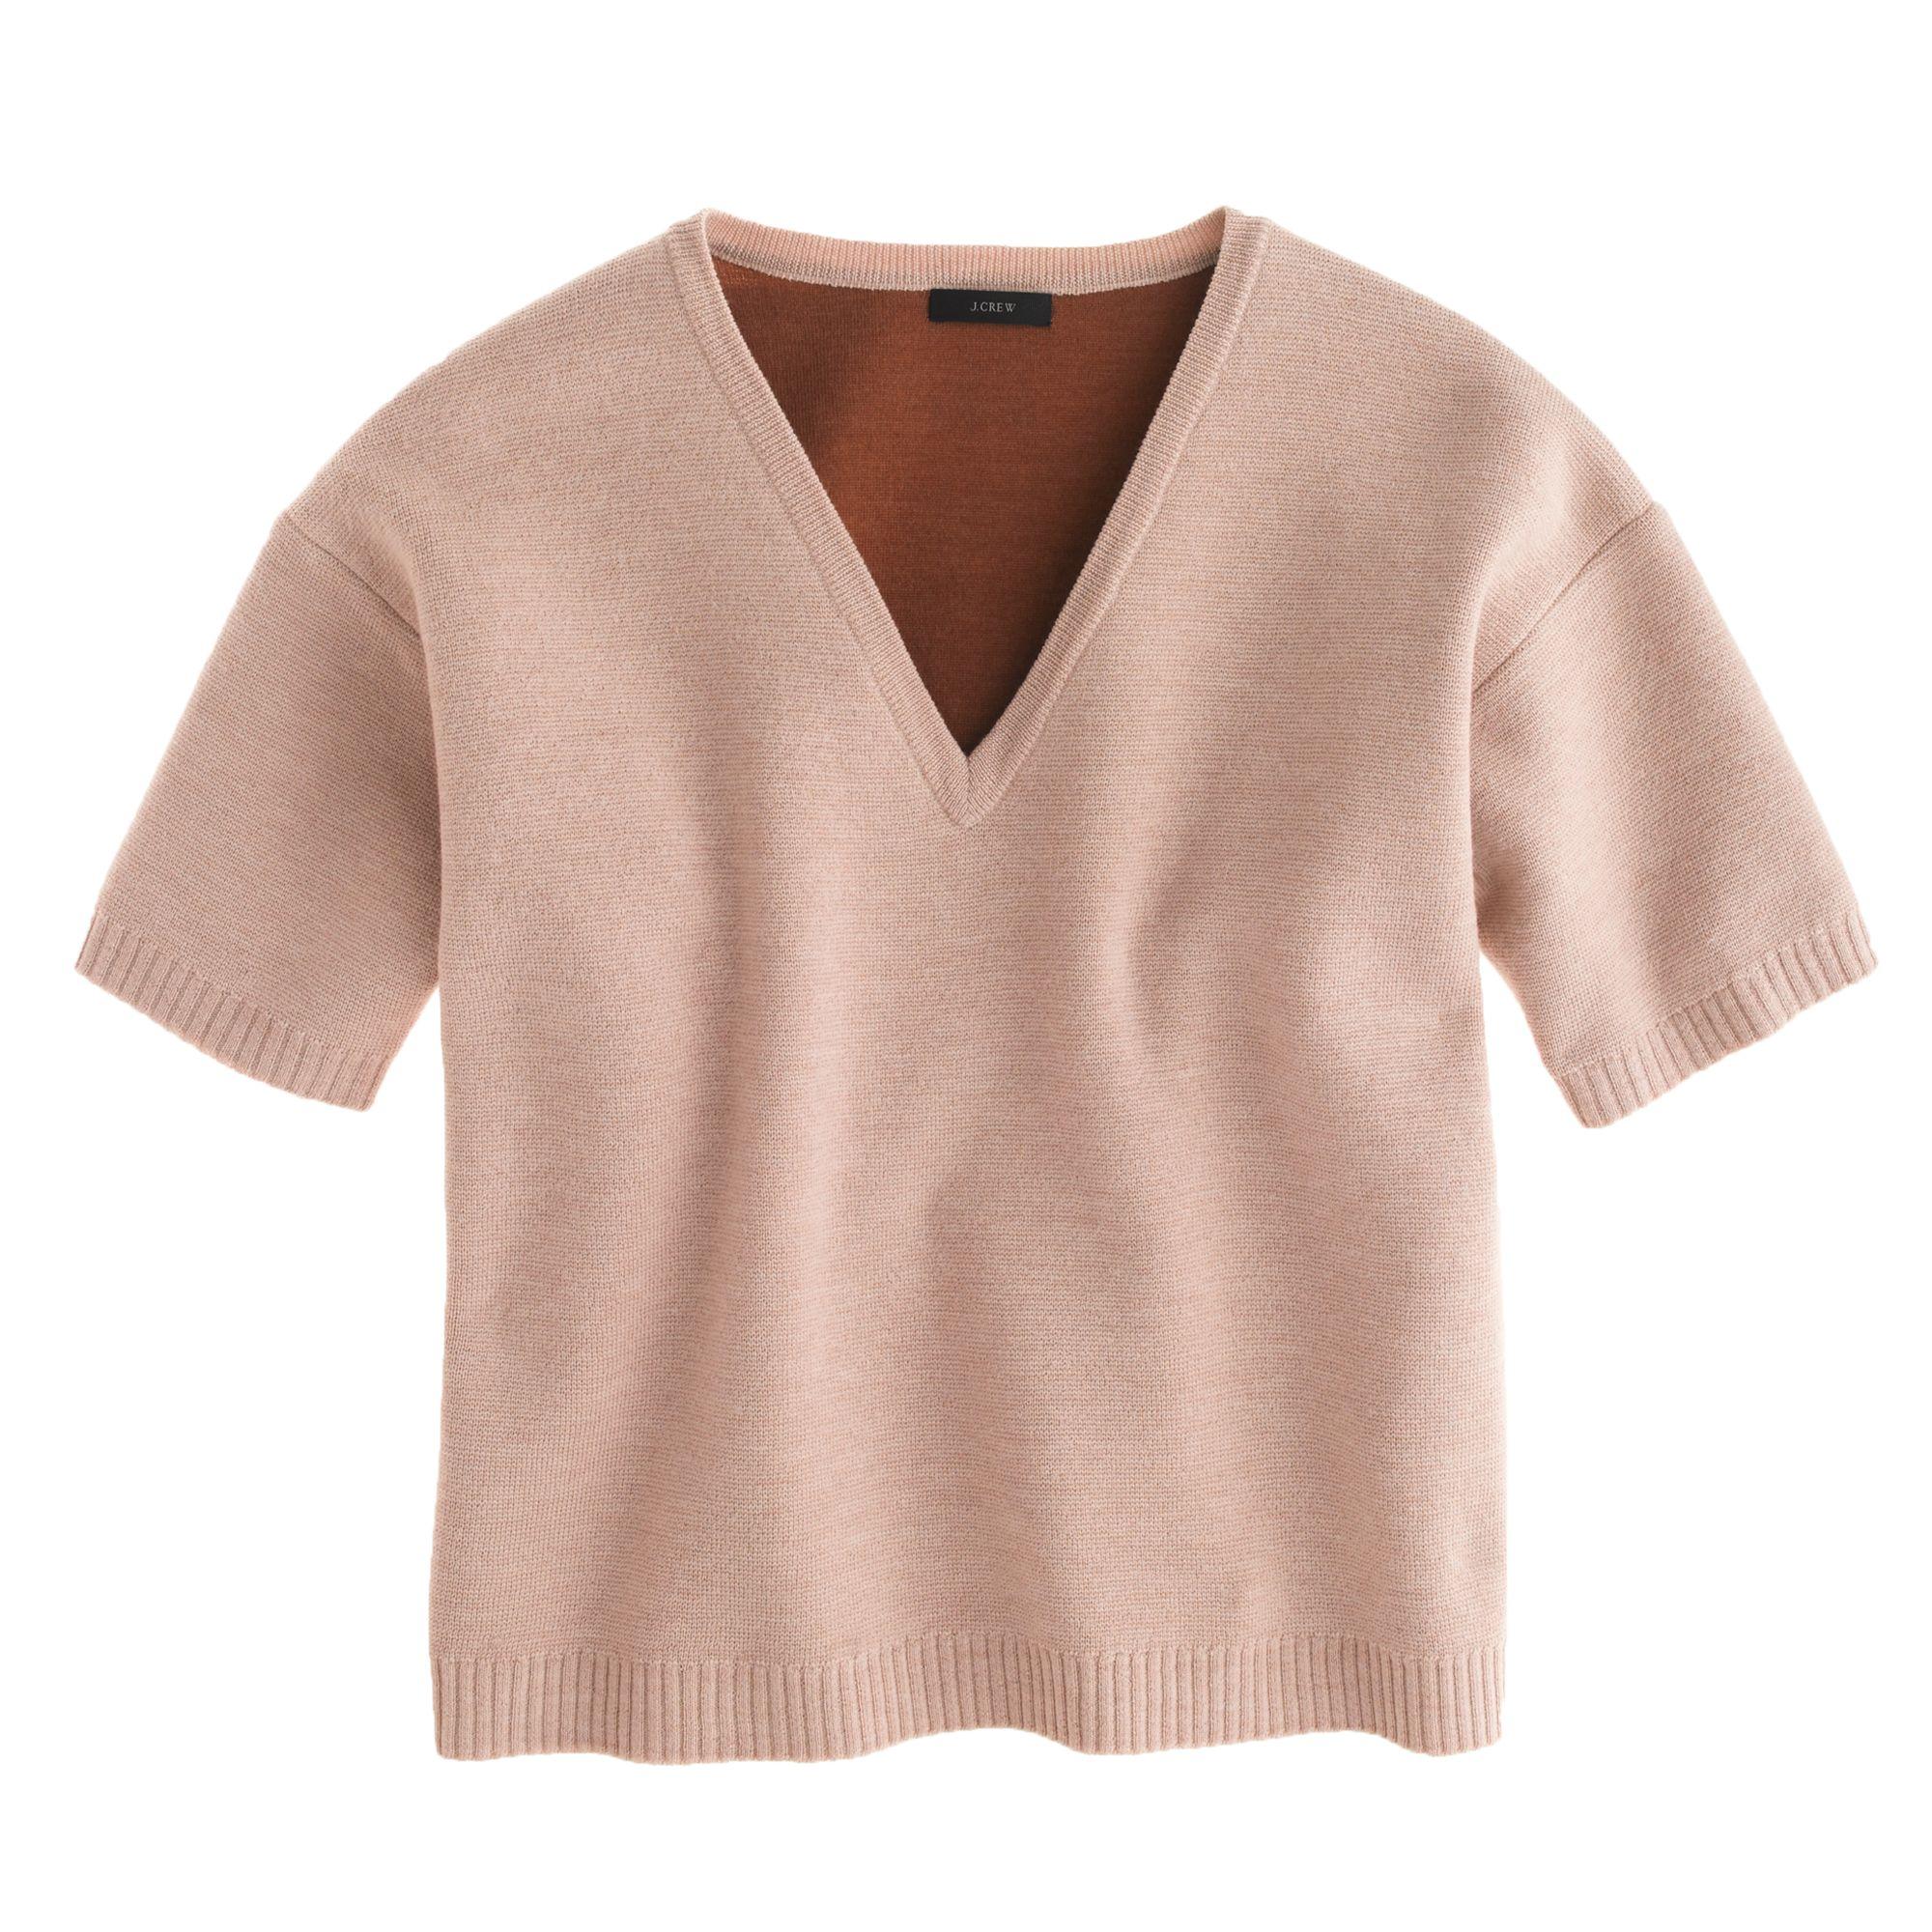 69babb5d29328 J.Crew Beige Collection Bonded Merino Sweater